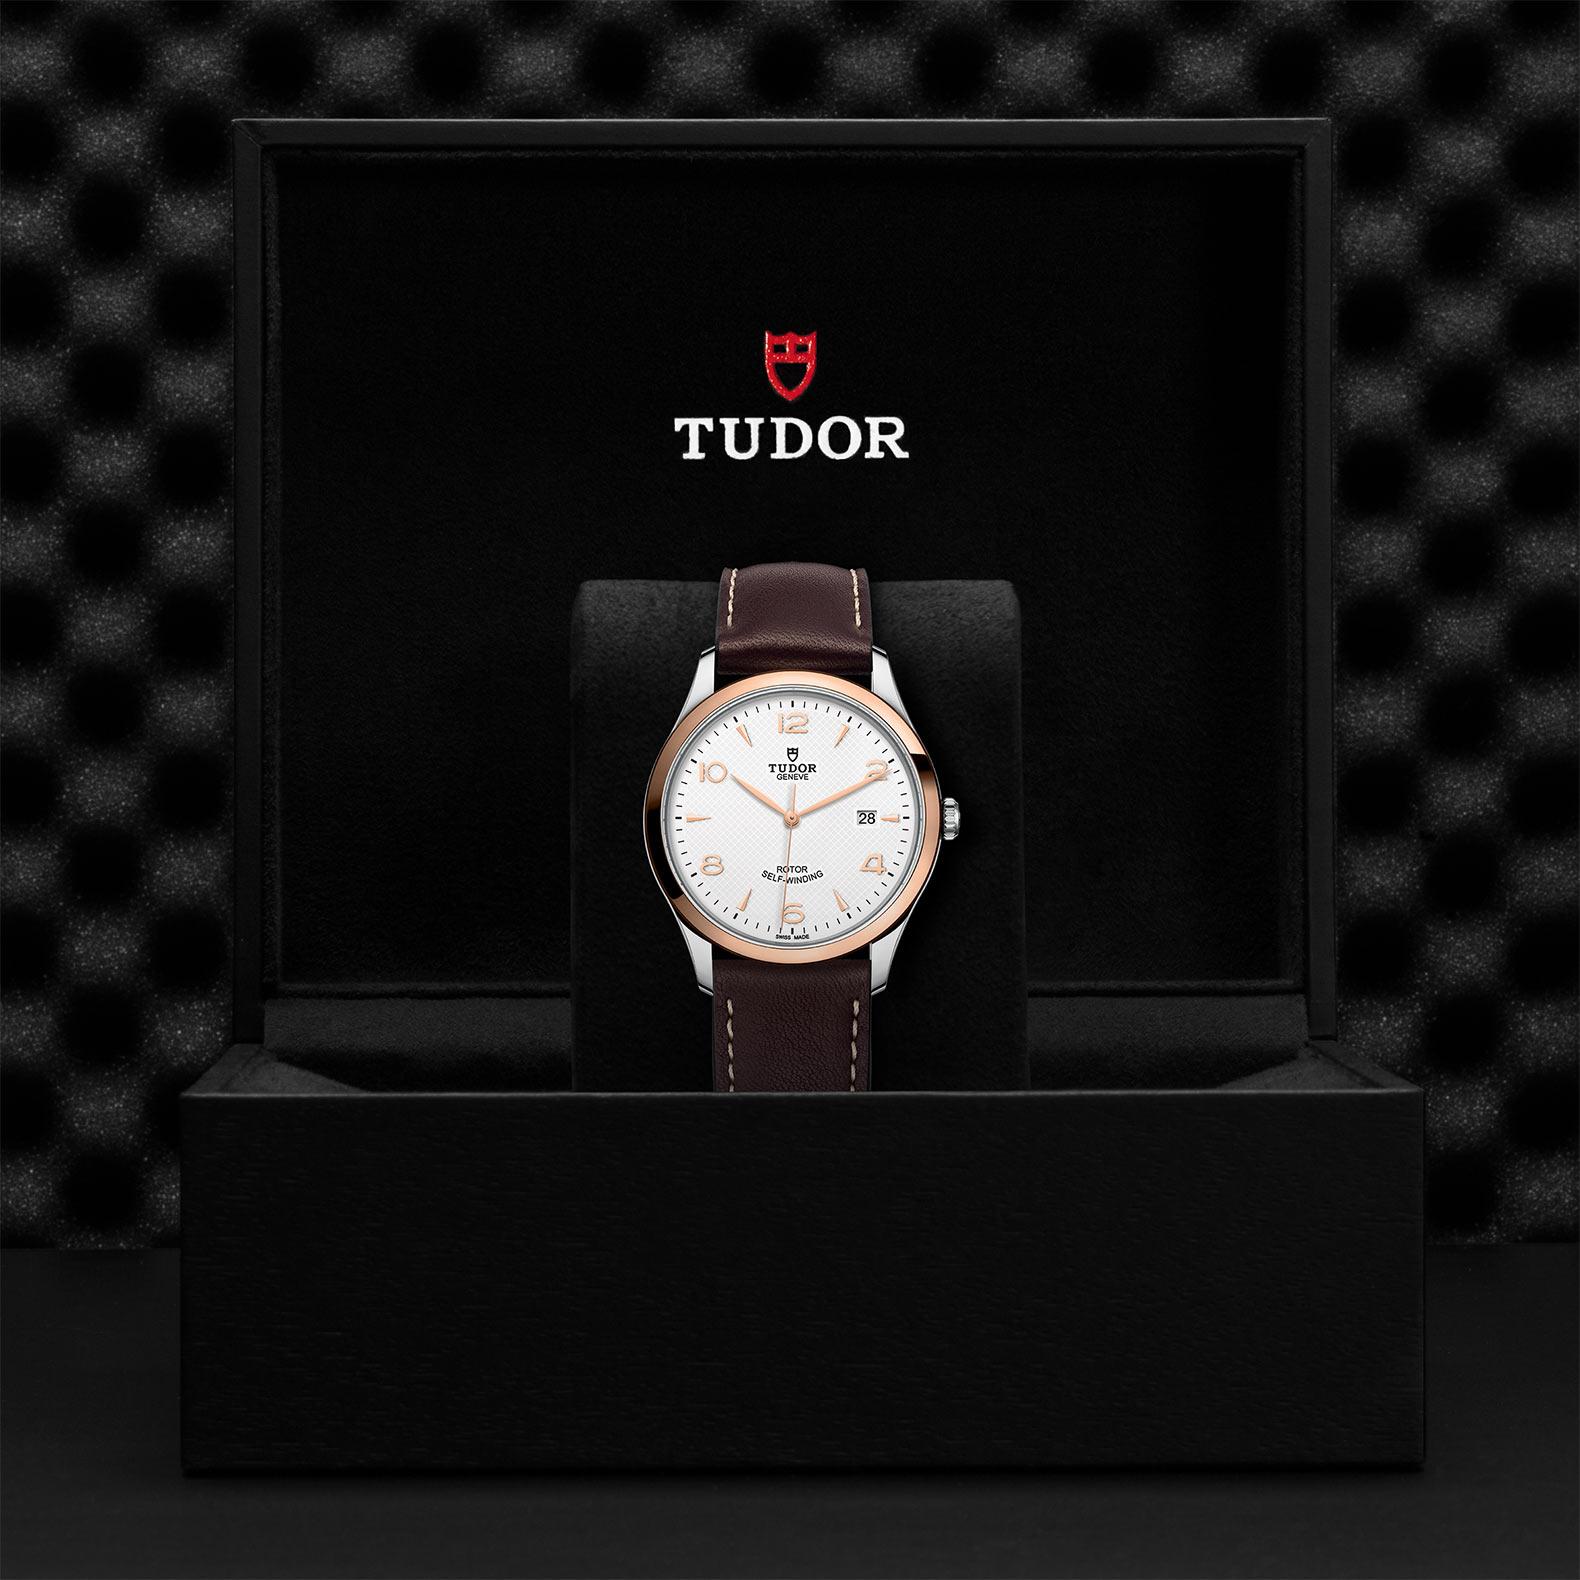 TUDOR 1926 - M91651-0010